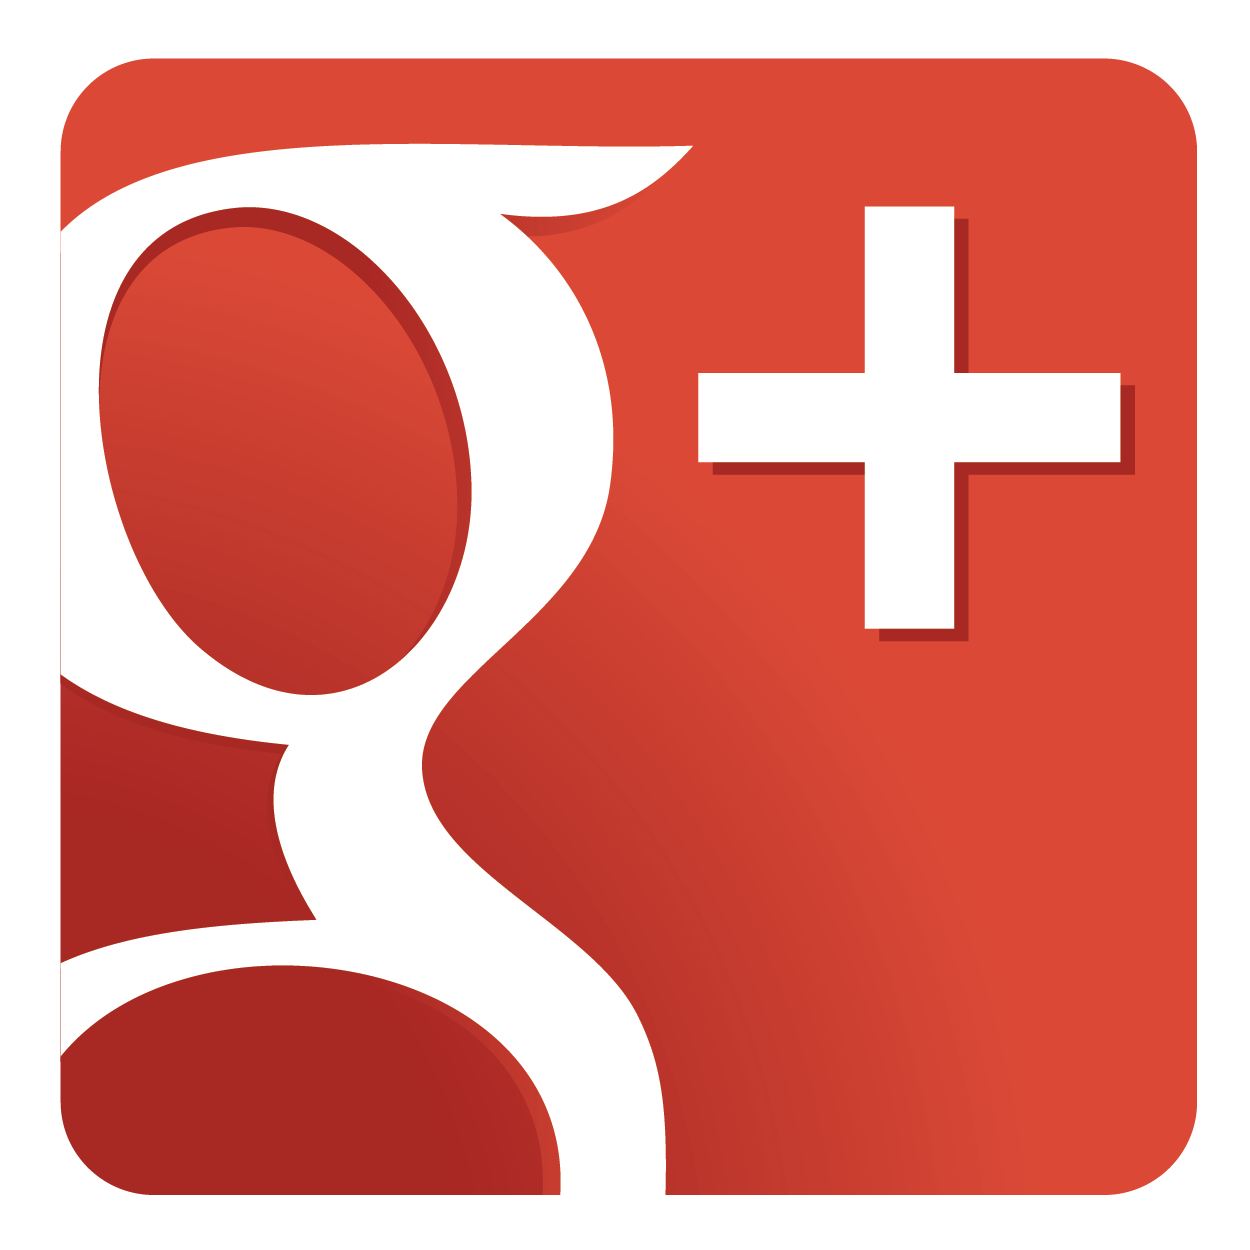 Google+で2018年9月例会「柳橋物語」 - 香川市民劇場を共有